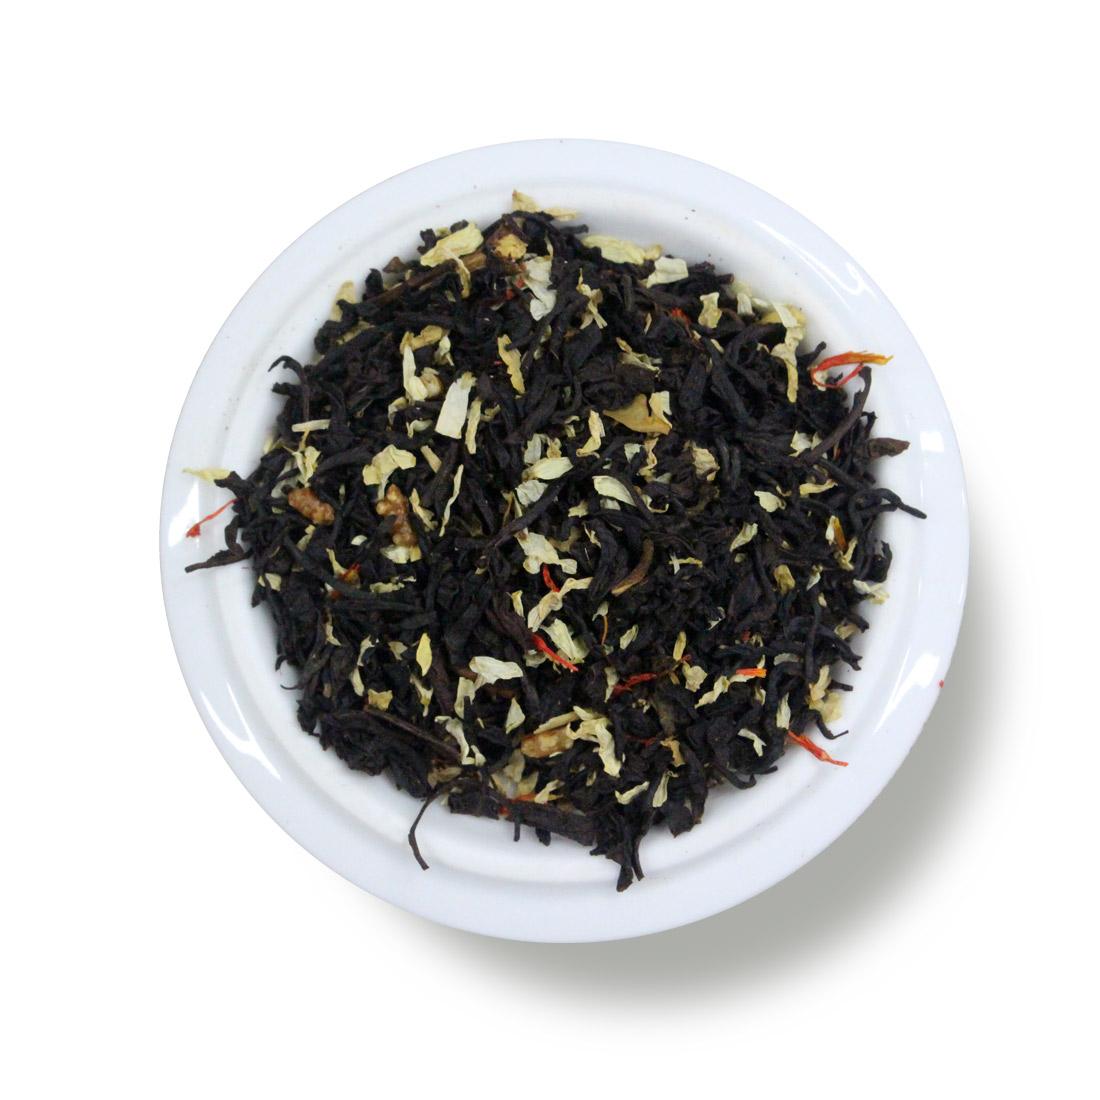 Black Tea Caramel Popcorn